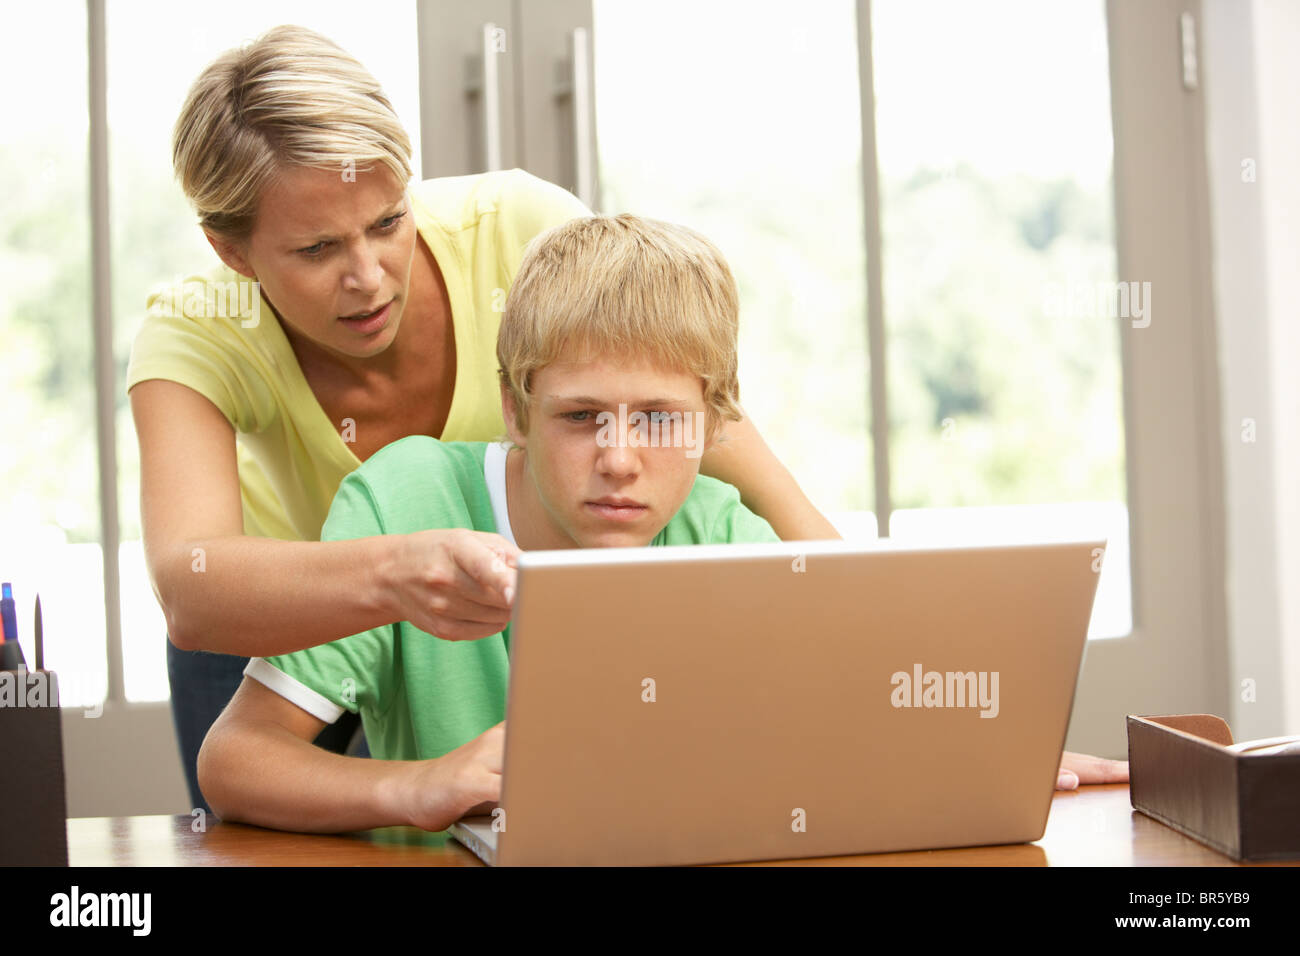 Сын и мат 14 фотография